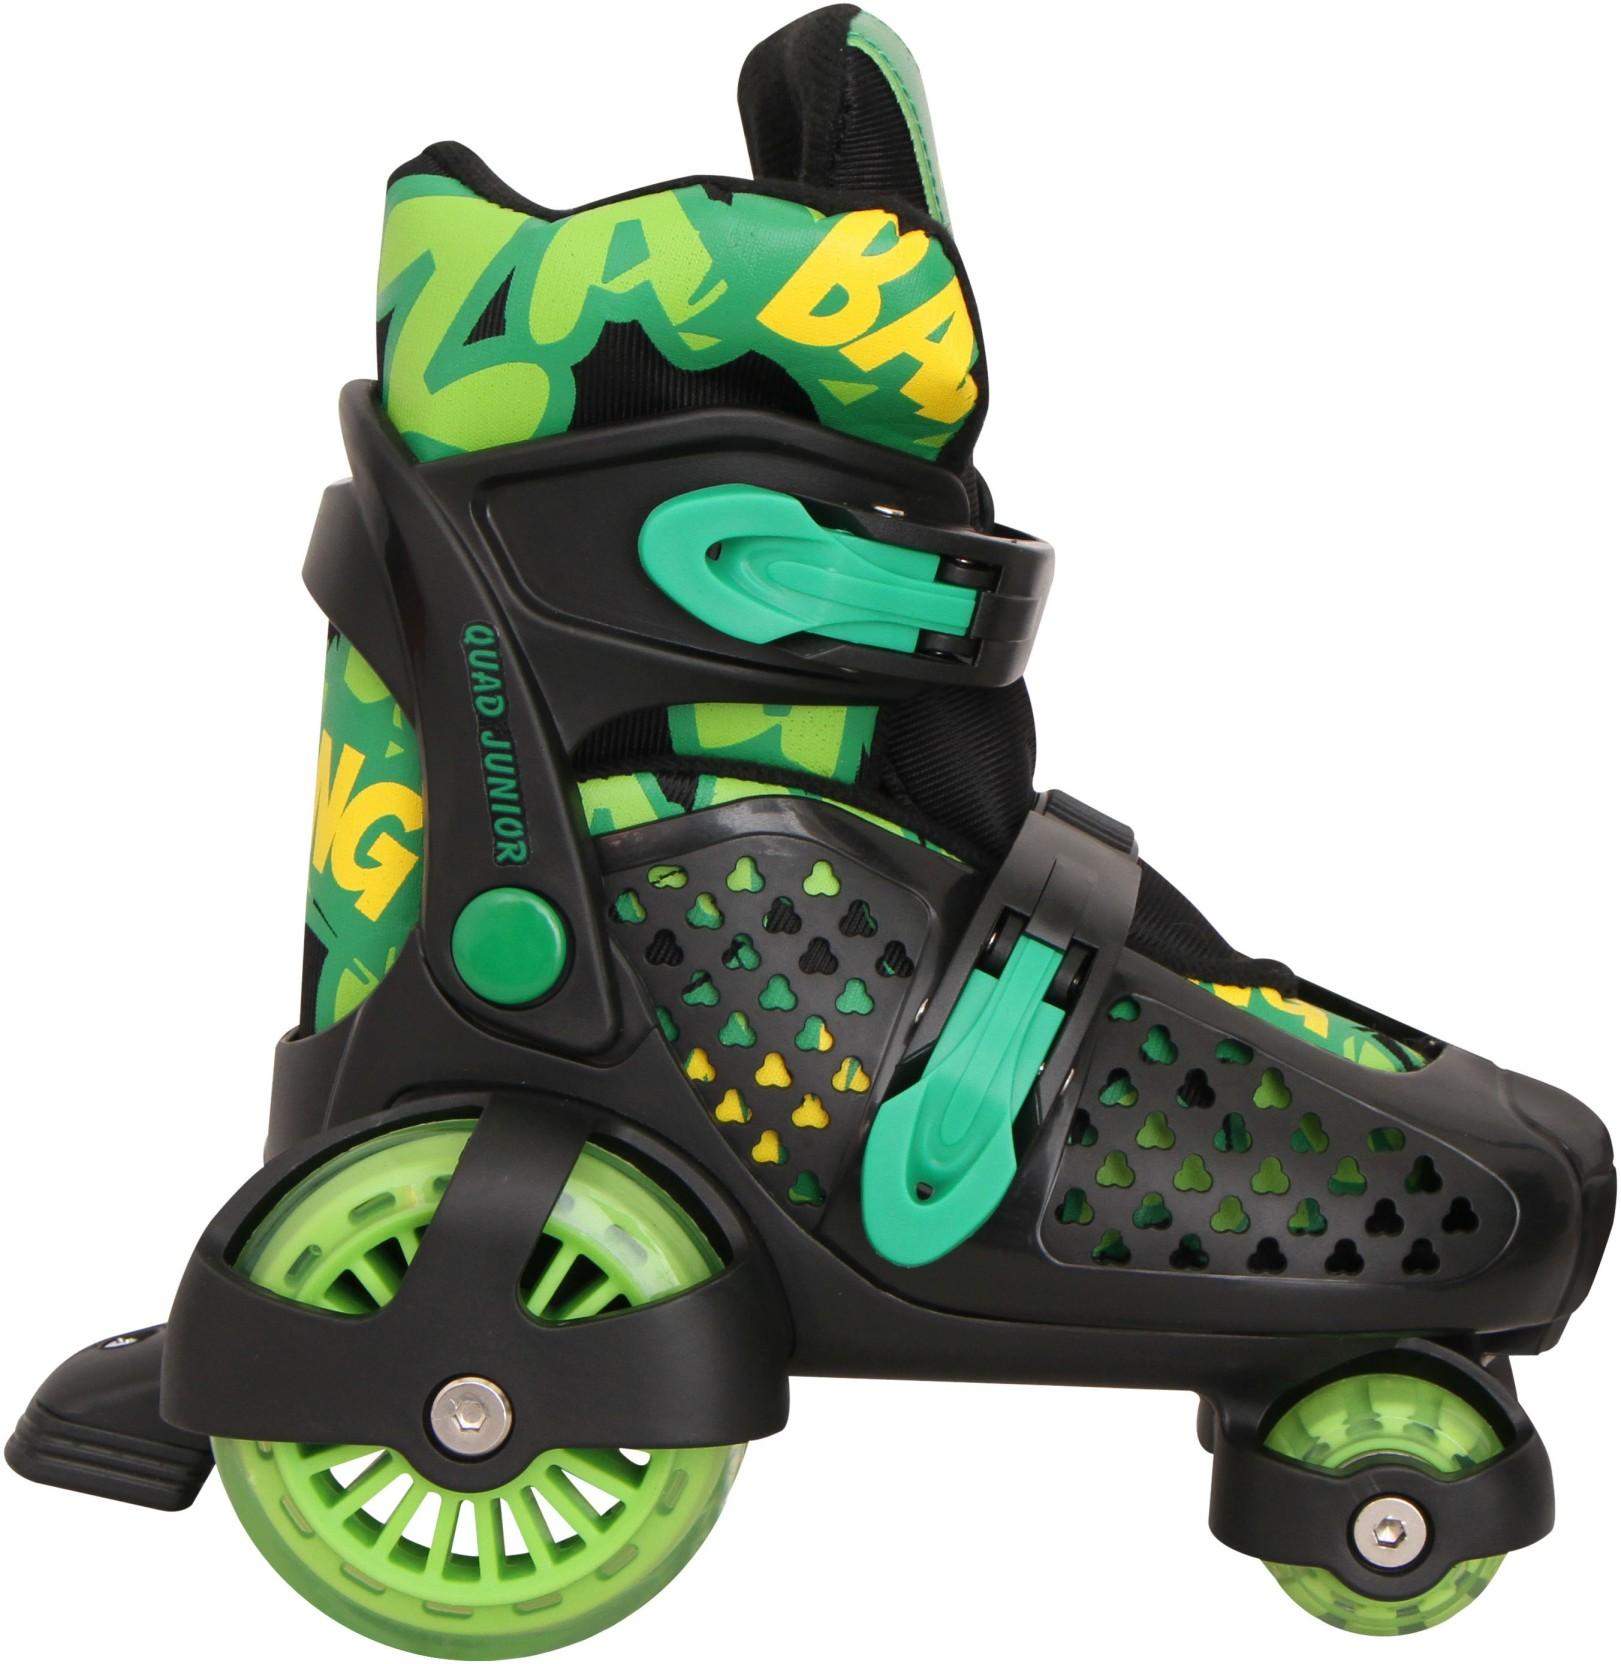 7c3a53e09f6 Nivia Junior Quad Roller Skates - Size 13-2.5 - Buy Nivia Junior ...